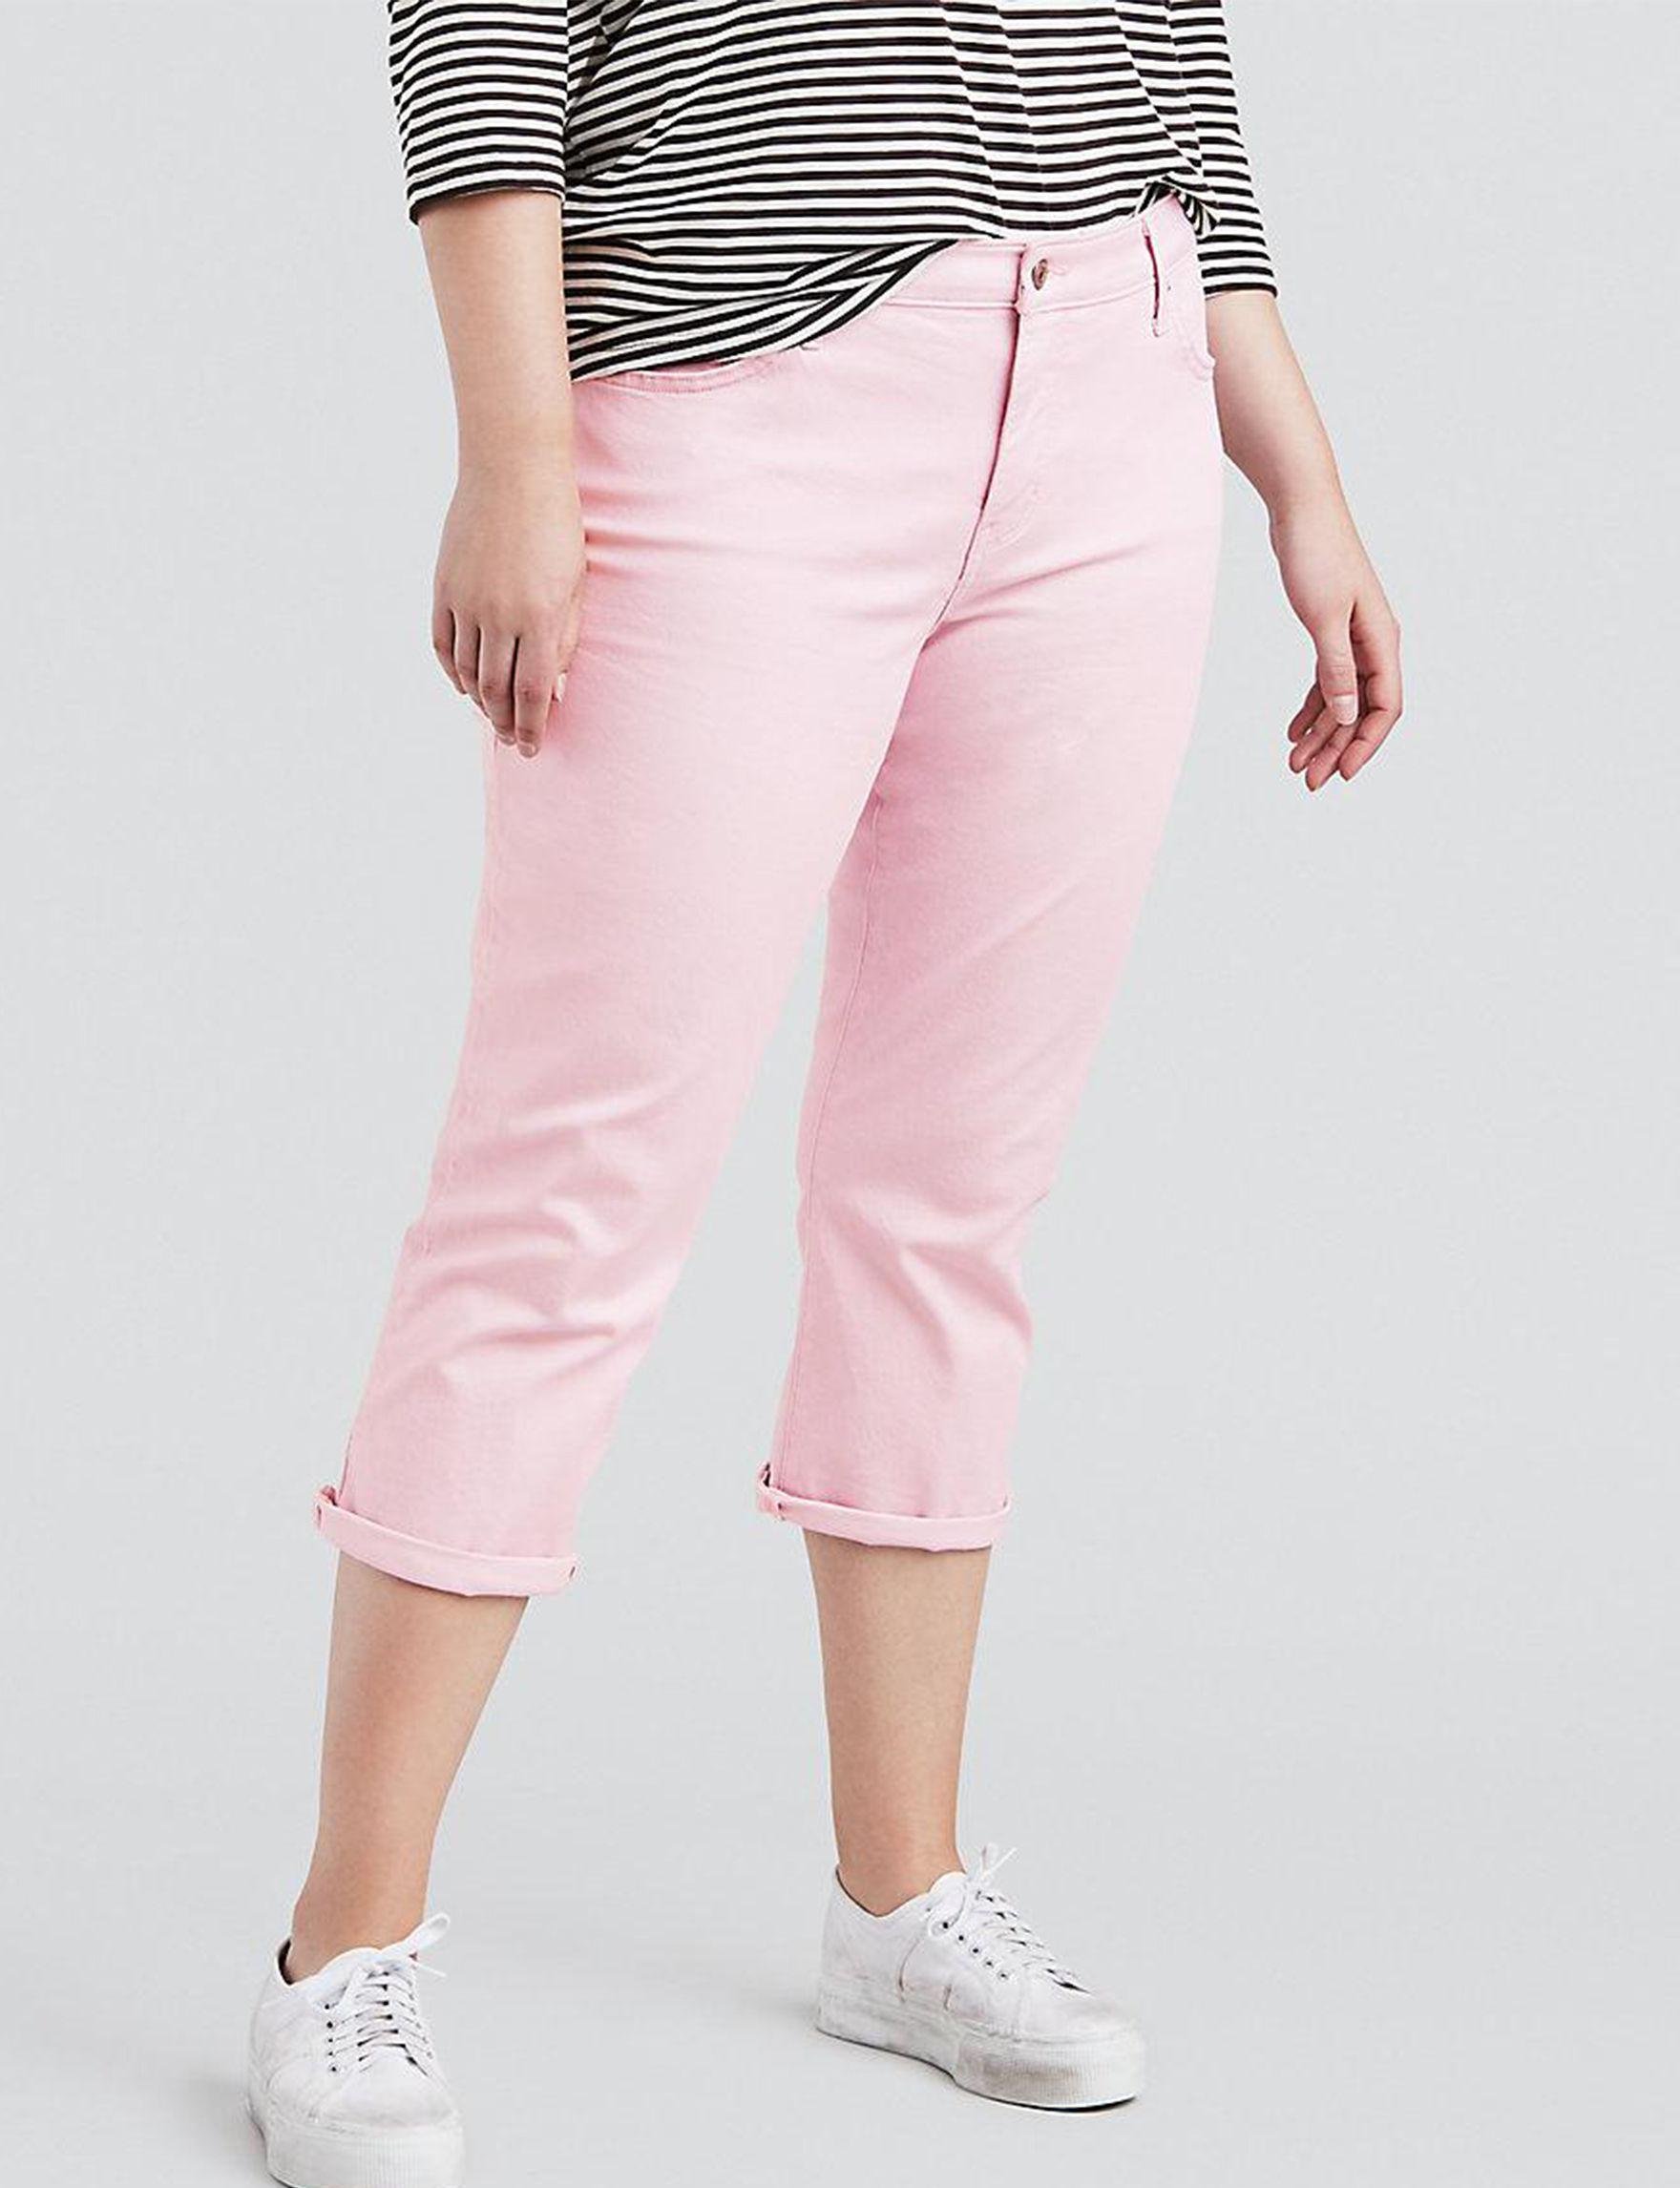 Levi's Pink Capris & Crops